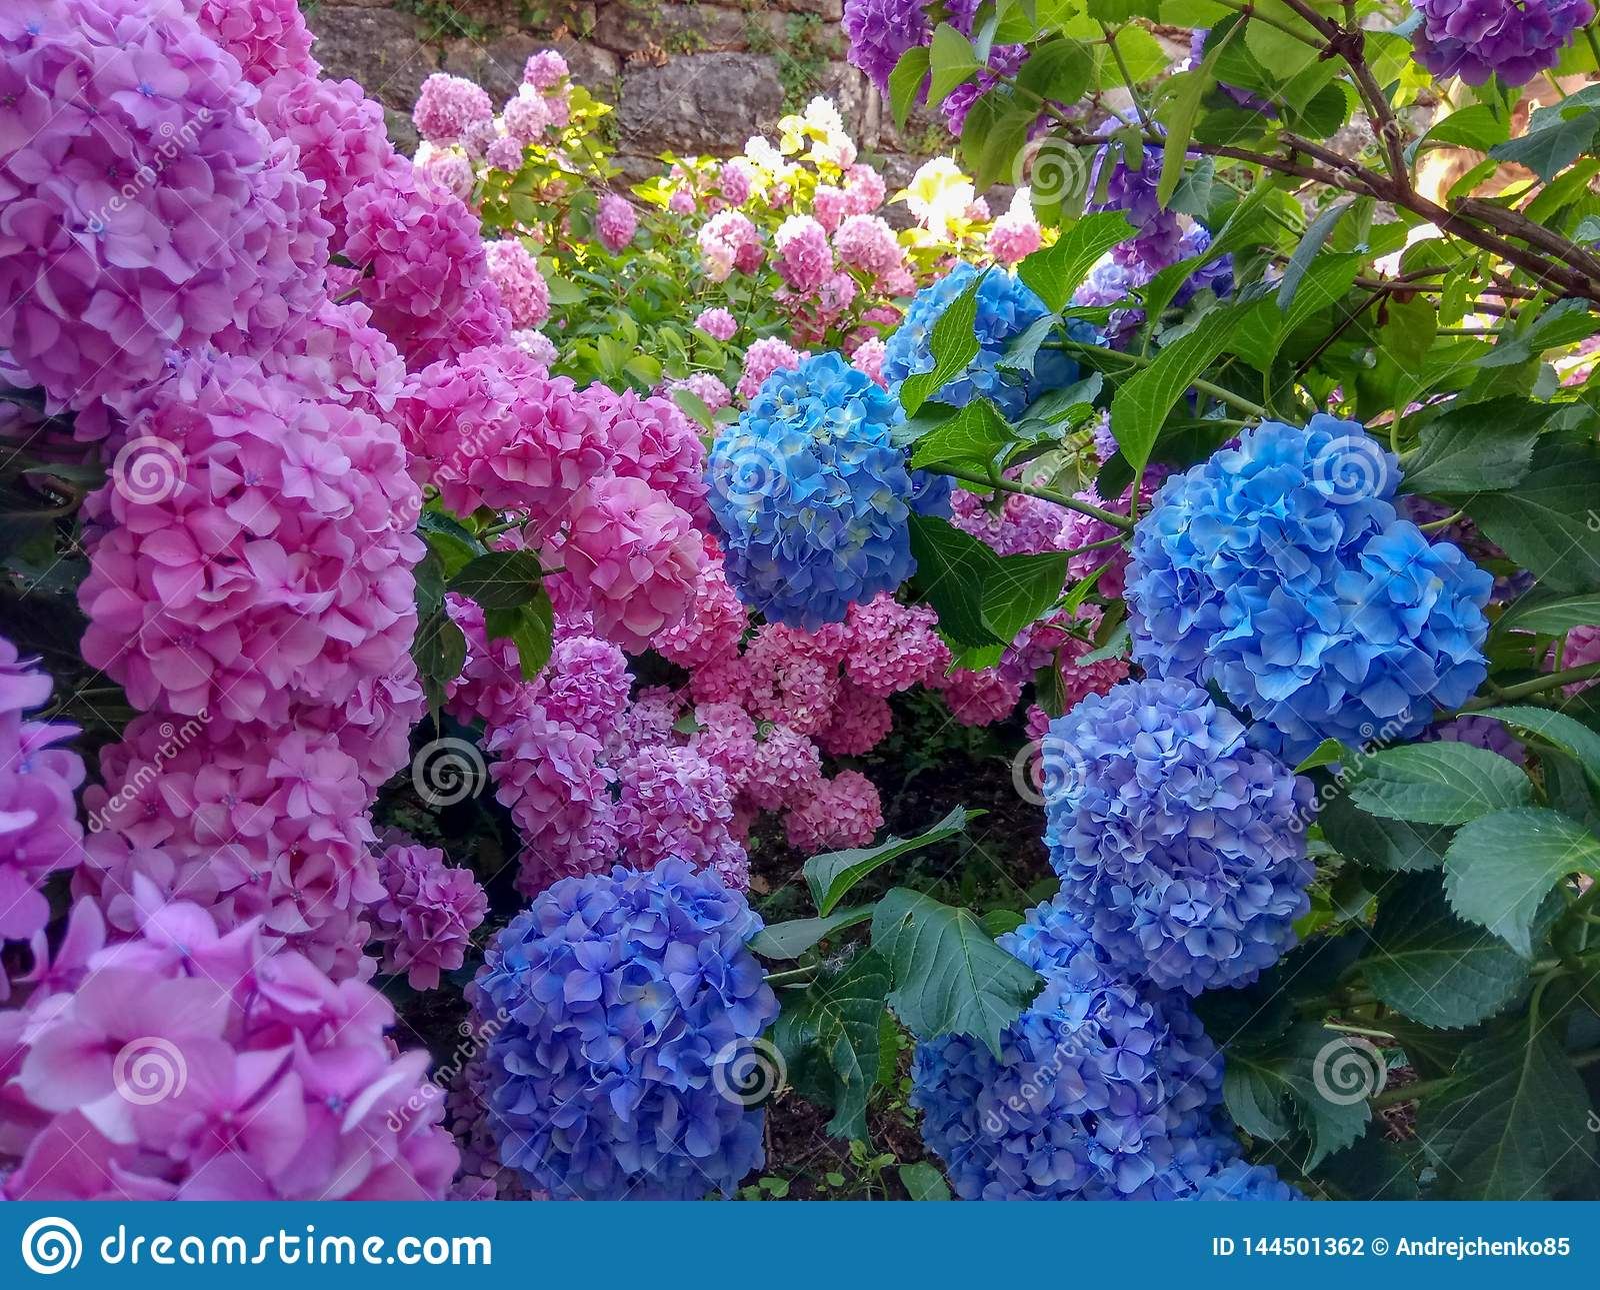 Hydrangea Is Pink Blue Violet Purple Bushes Of Flowers